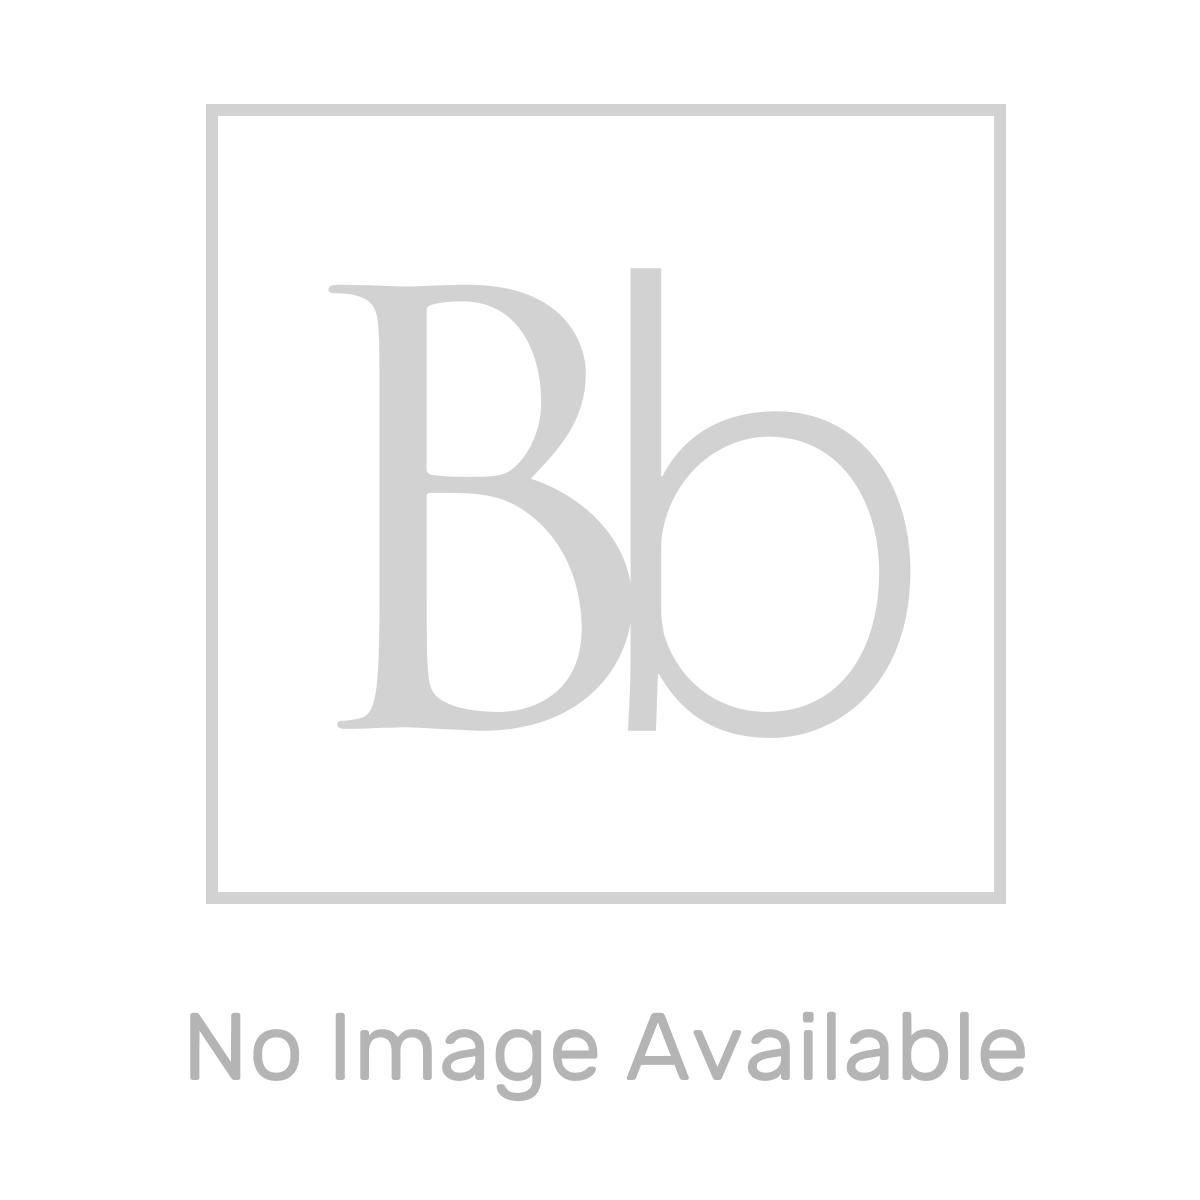 Nuie Athena Gloss White 2 Door Floor Standing Vanity Unit with 18mm Profile Basin 600mm